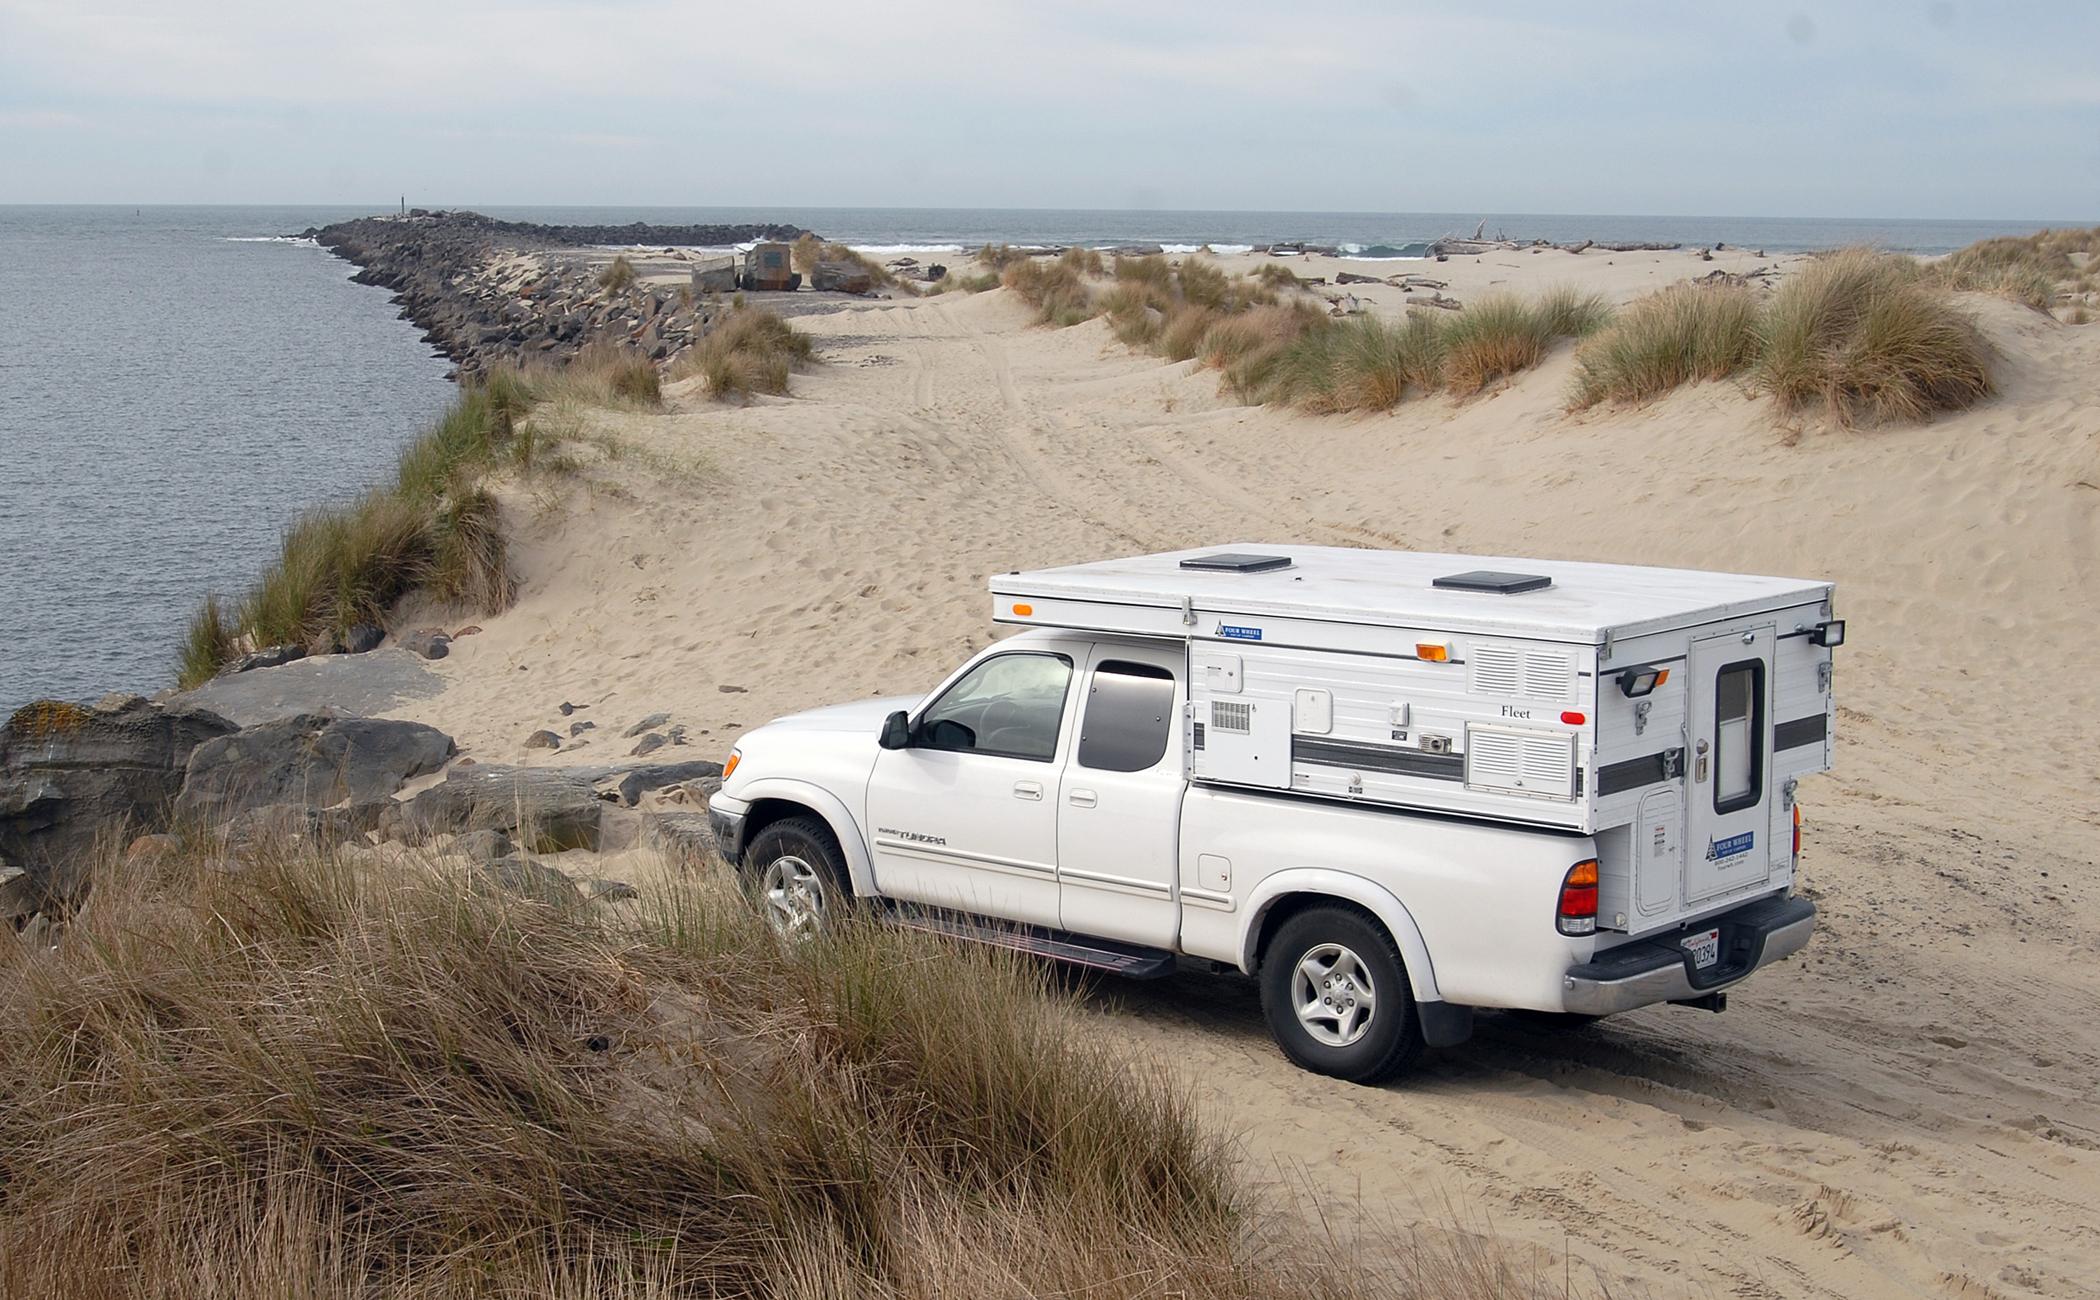 Pop-up Camper: Minimalist RV Camping, Maximum Versatility